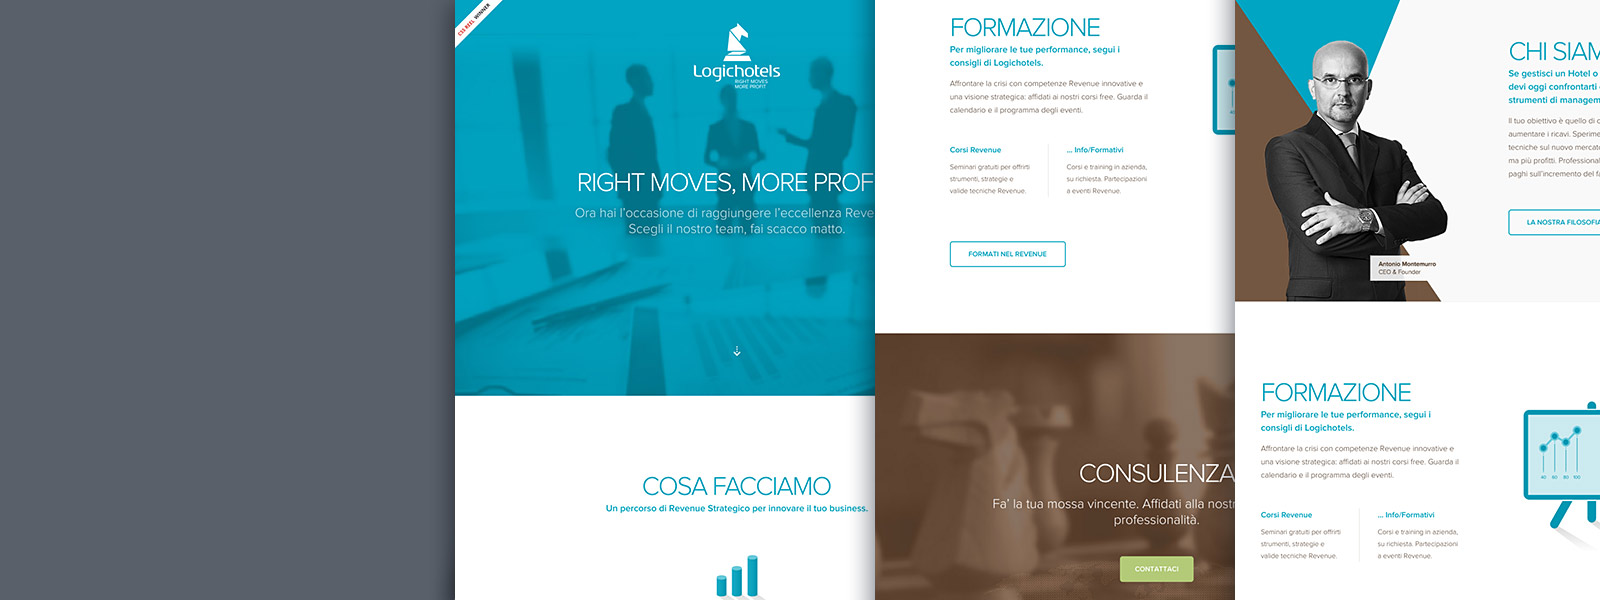 Muse Comunicazione: Logichotels Caso di Studio